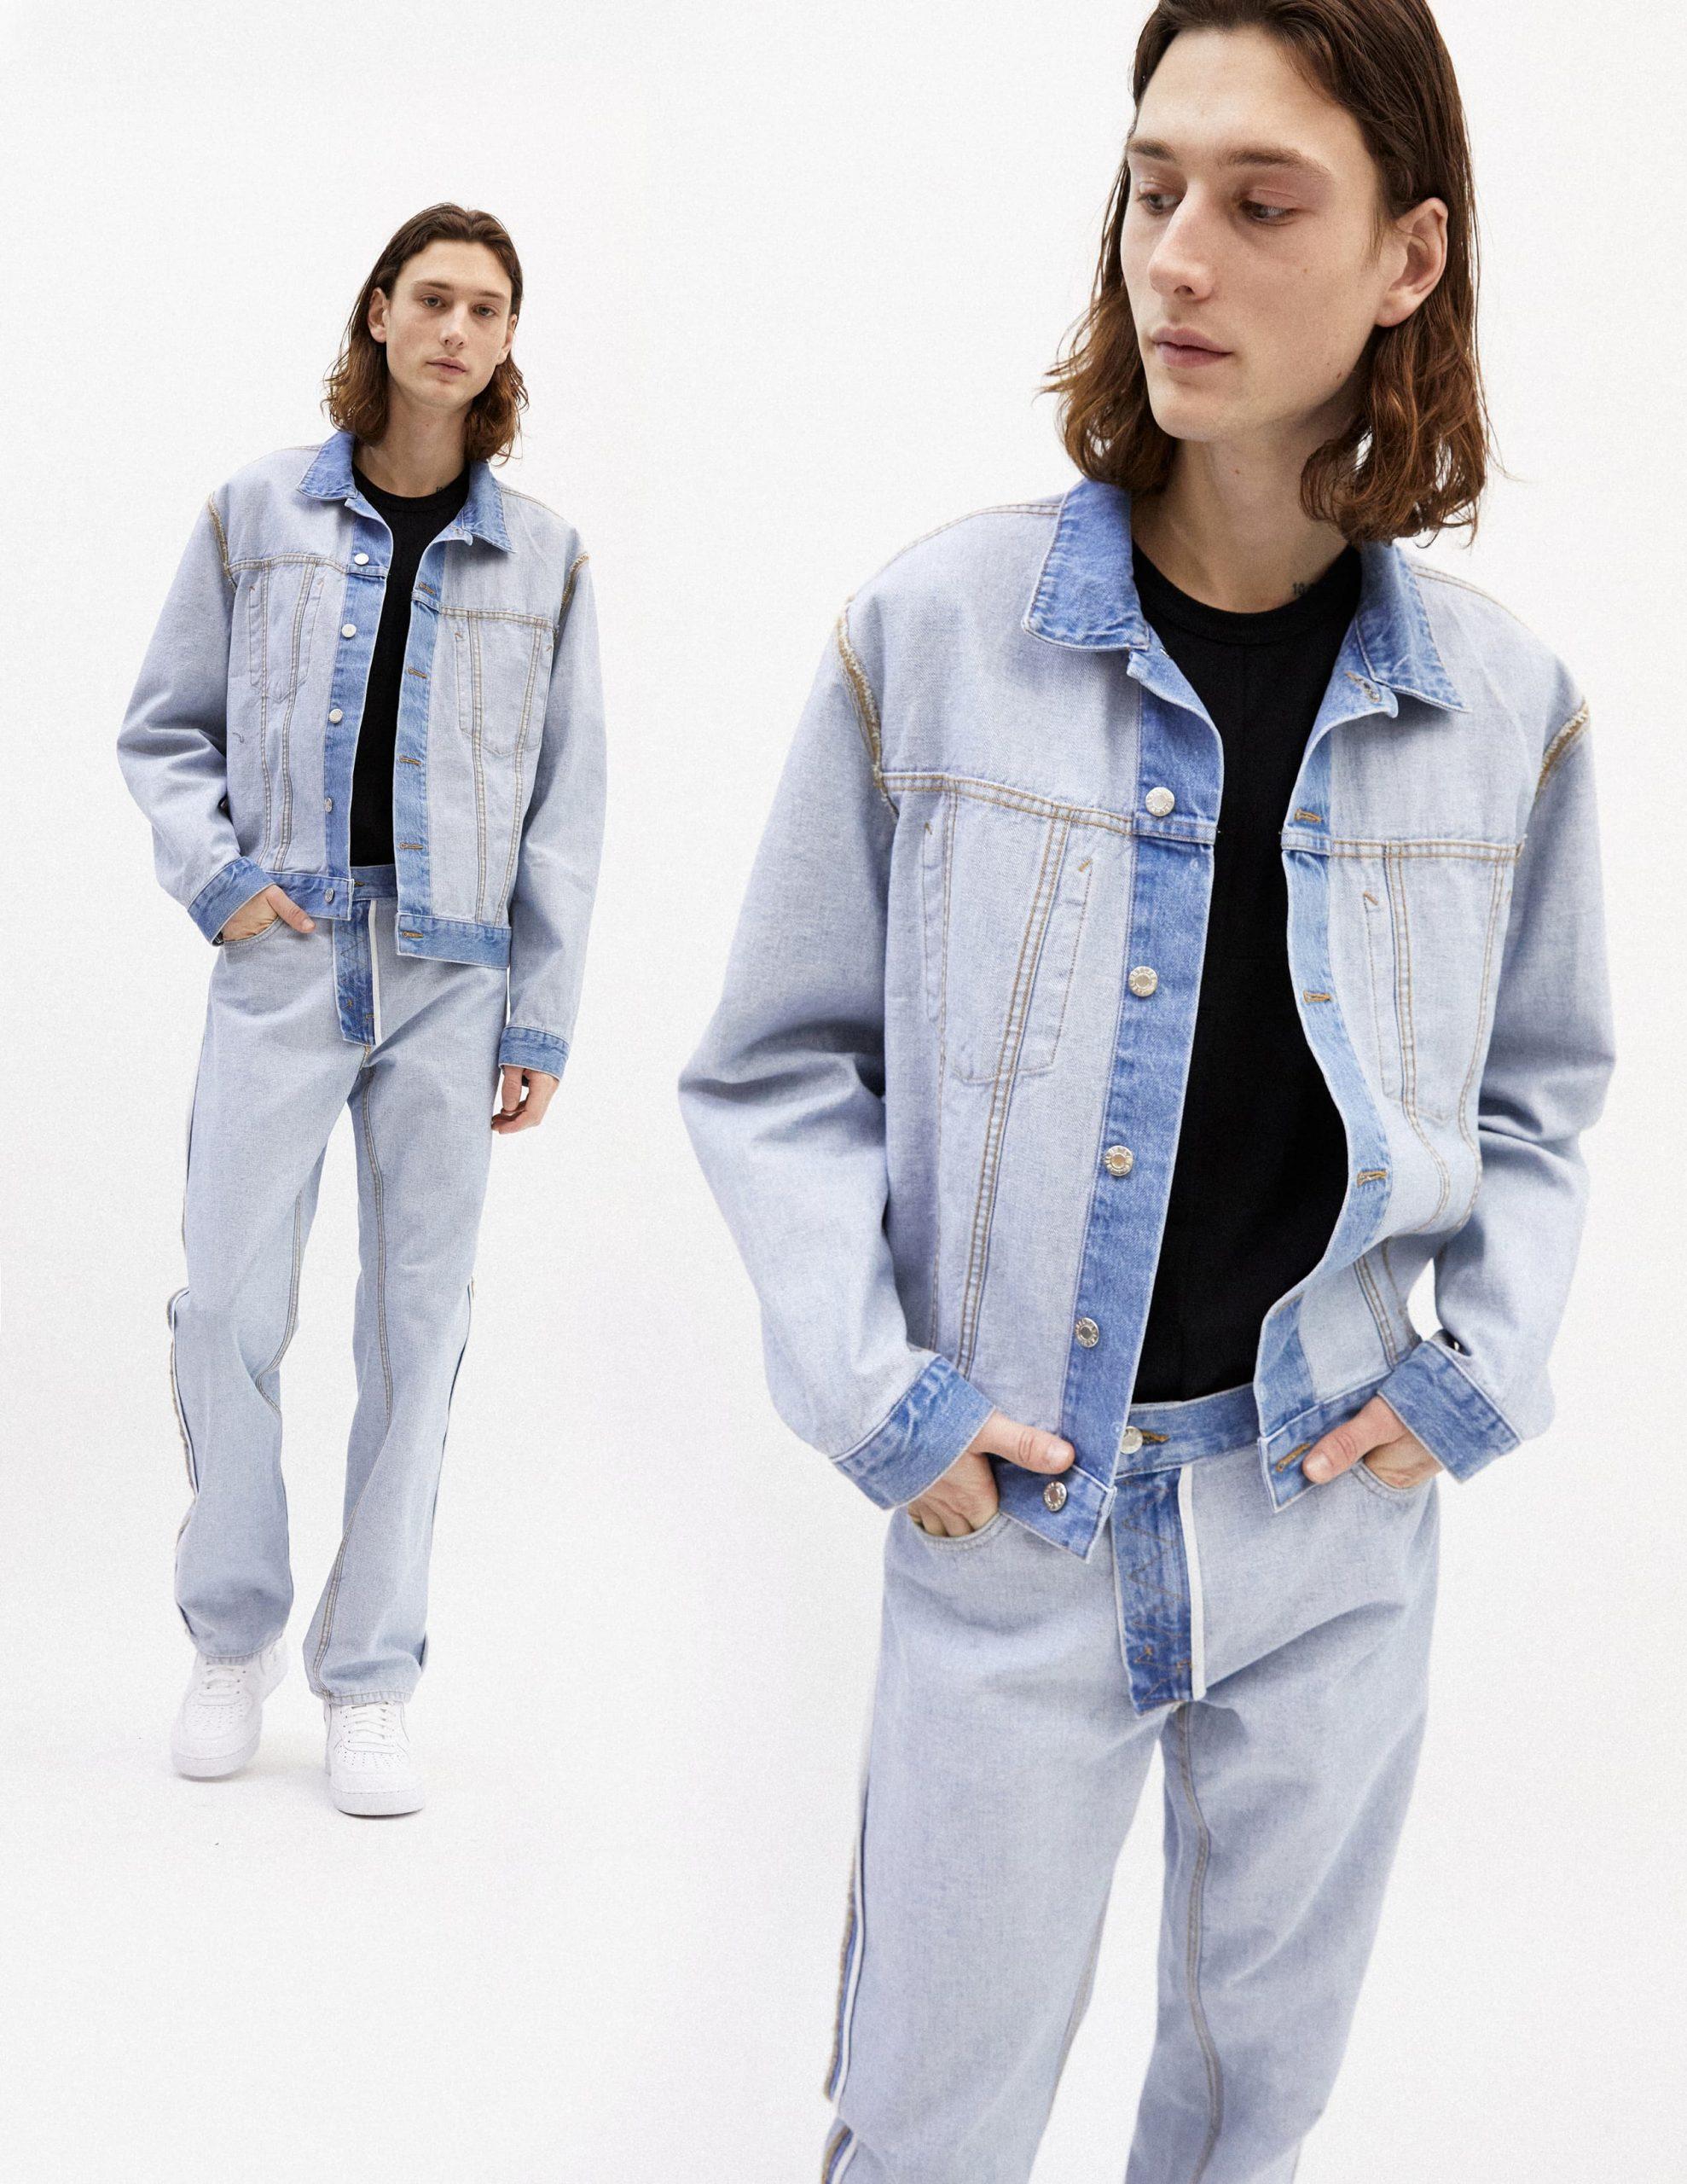 Helmut Lang Fall 2021 Men's Fashion Show Photos